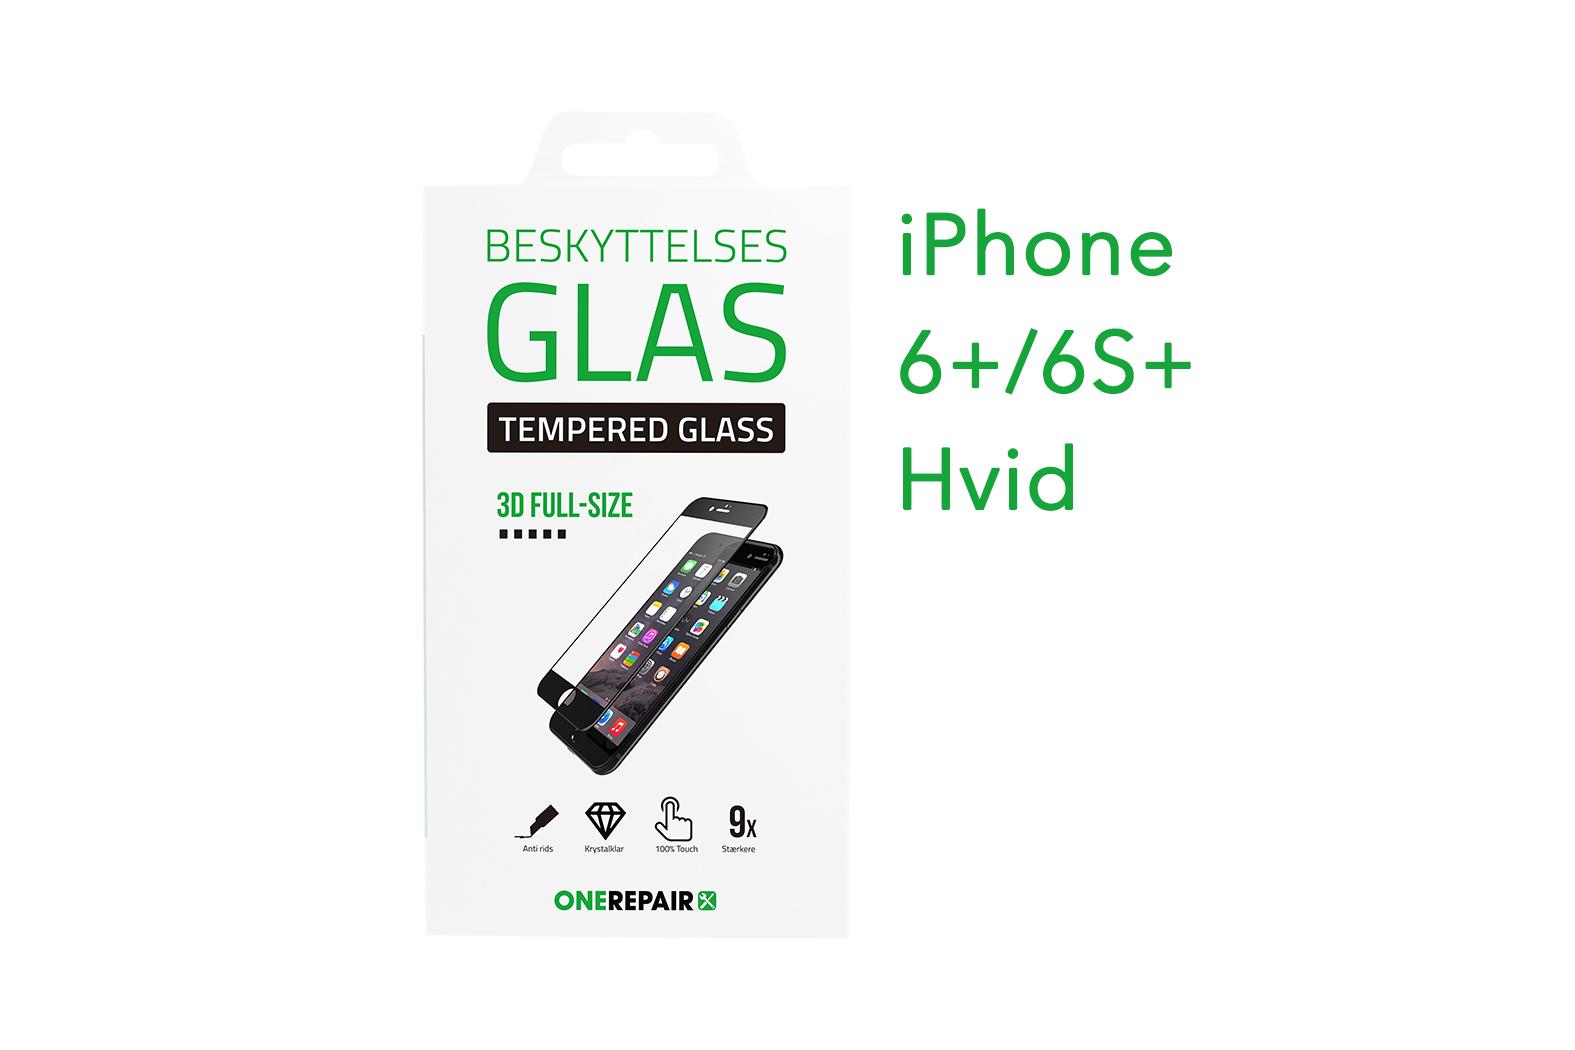 beskyttelsesglas, beskyttelse, glas, iPhone 6+, 6S+, Plus, Apple, Fullsize, Full, Size, Pazer, Panser, Hvid, staerk, stærk, Godt, Billig, 3d